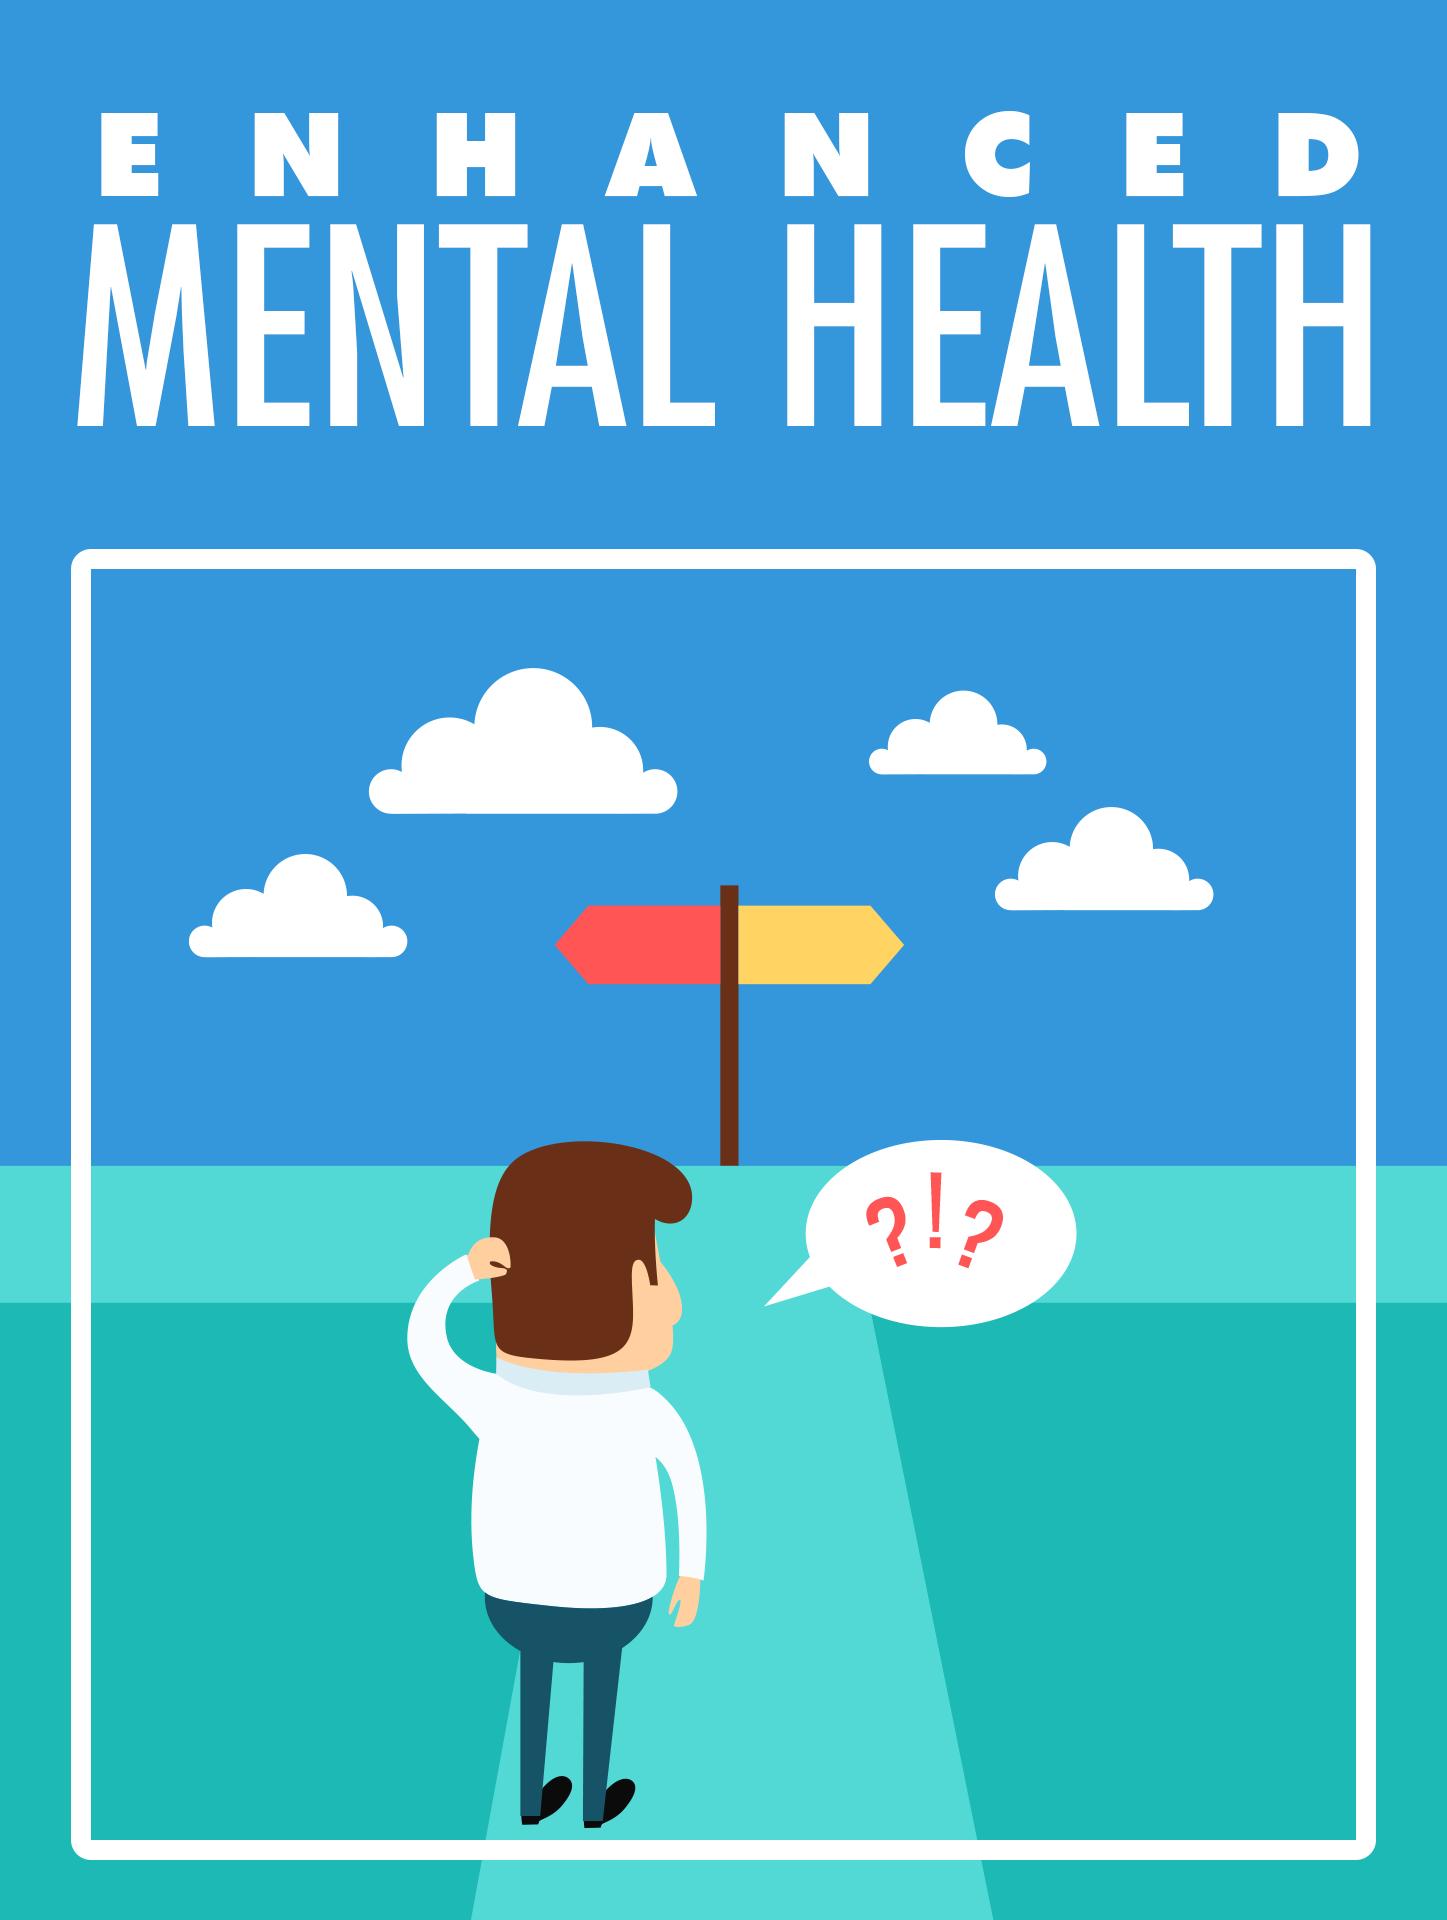 Enhanced Mental Health Ebook's Ebook Image